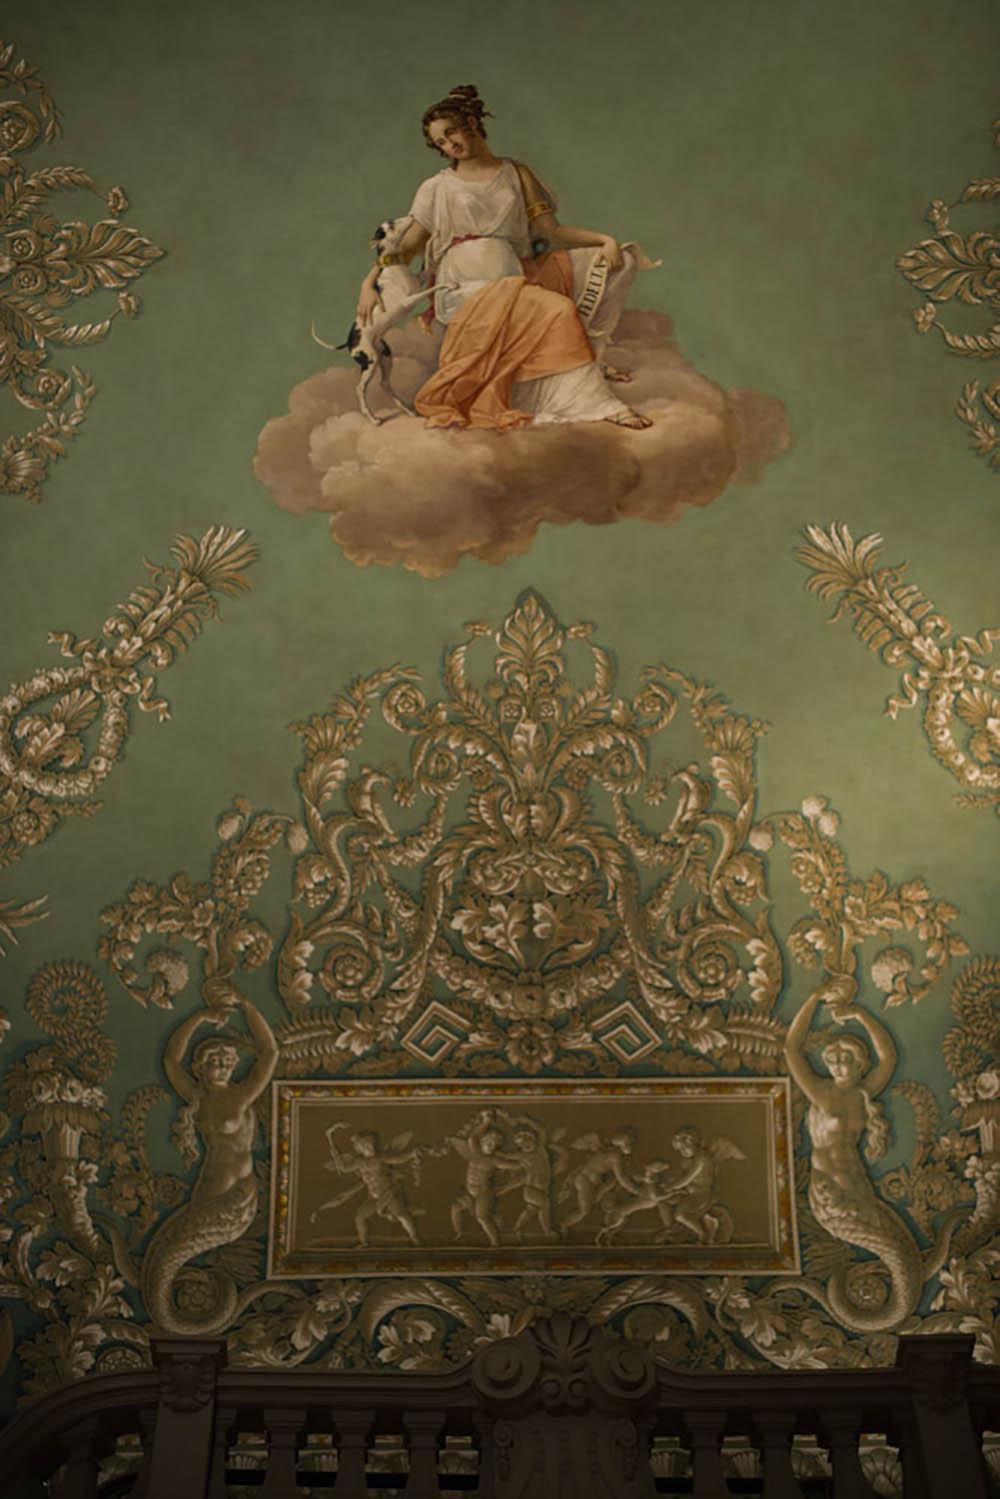 Palazzo Zevallos, napoli, italy, museum, artwork, beautiful